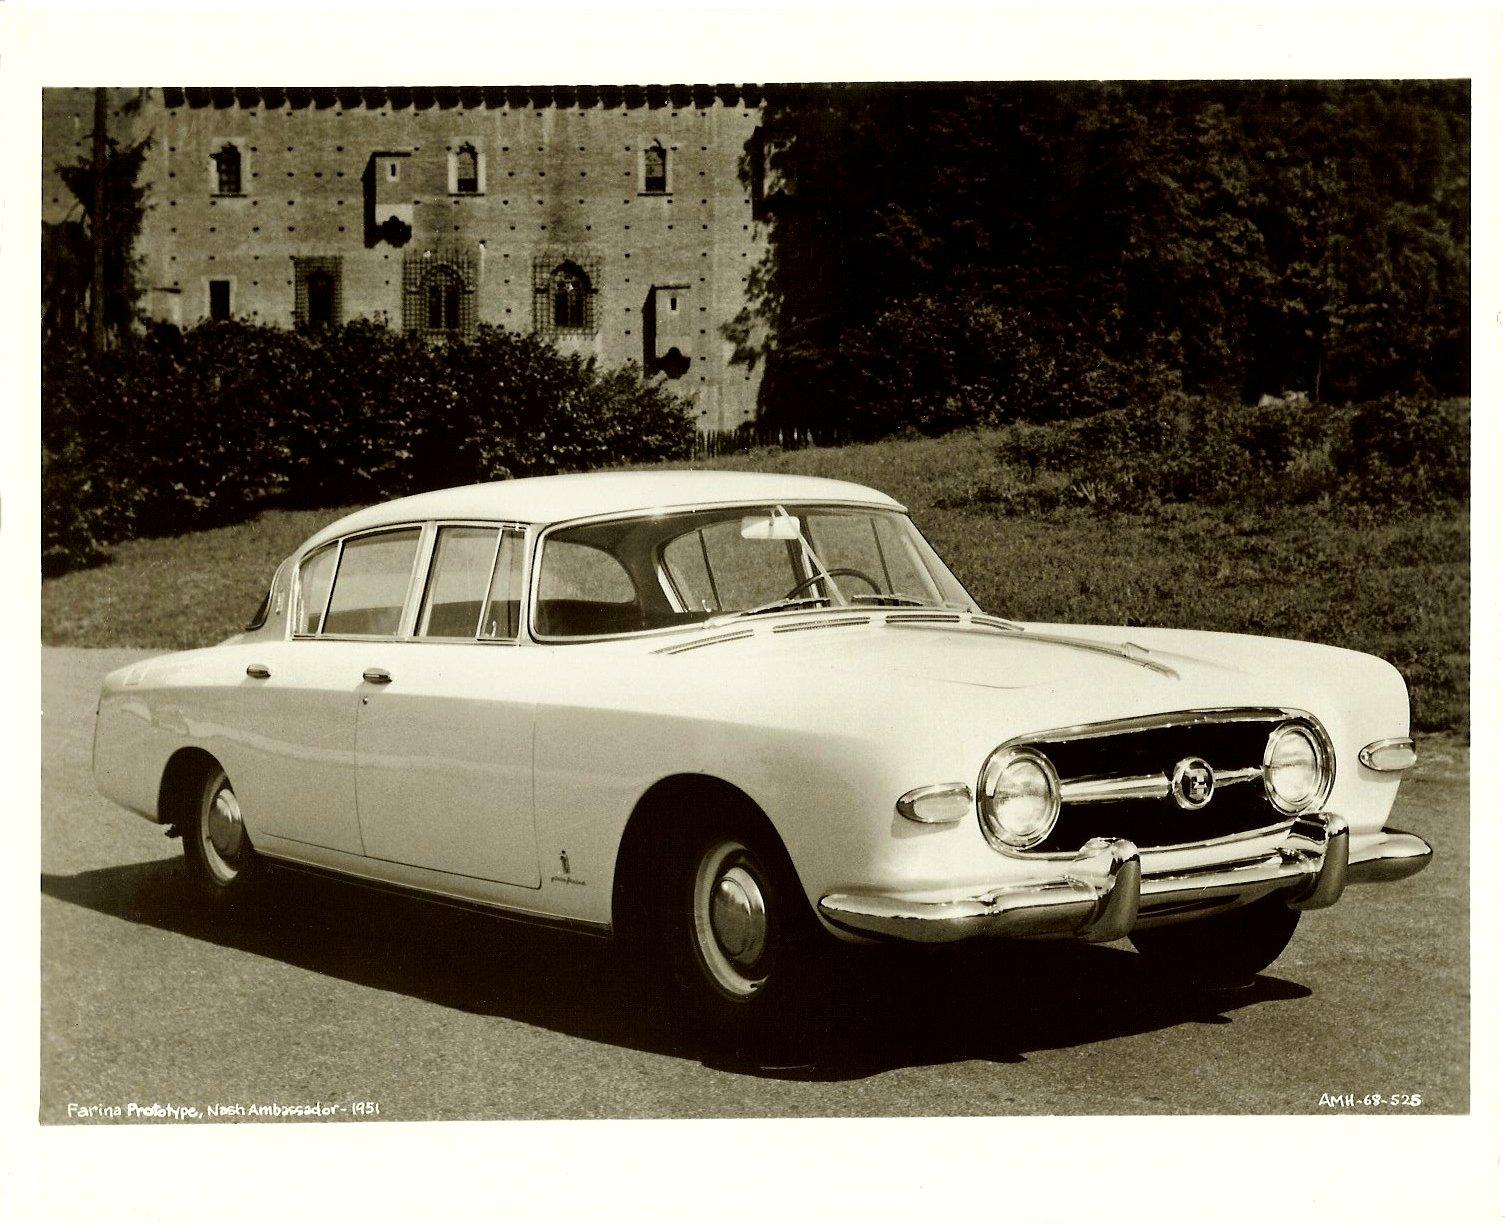 Farina prototype 1951 NASH Ambassador 10″x8″ Black & White photograph AMH-68-525